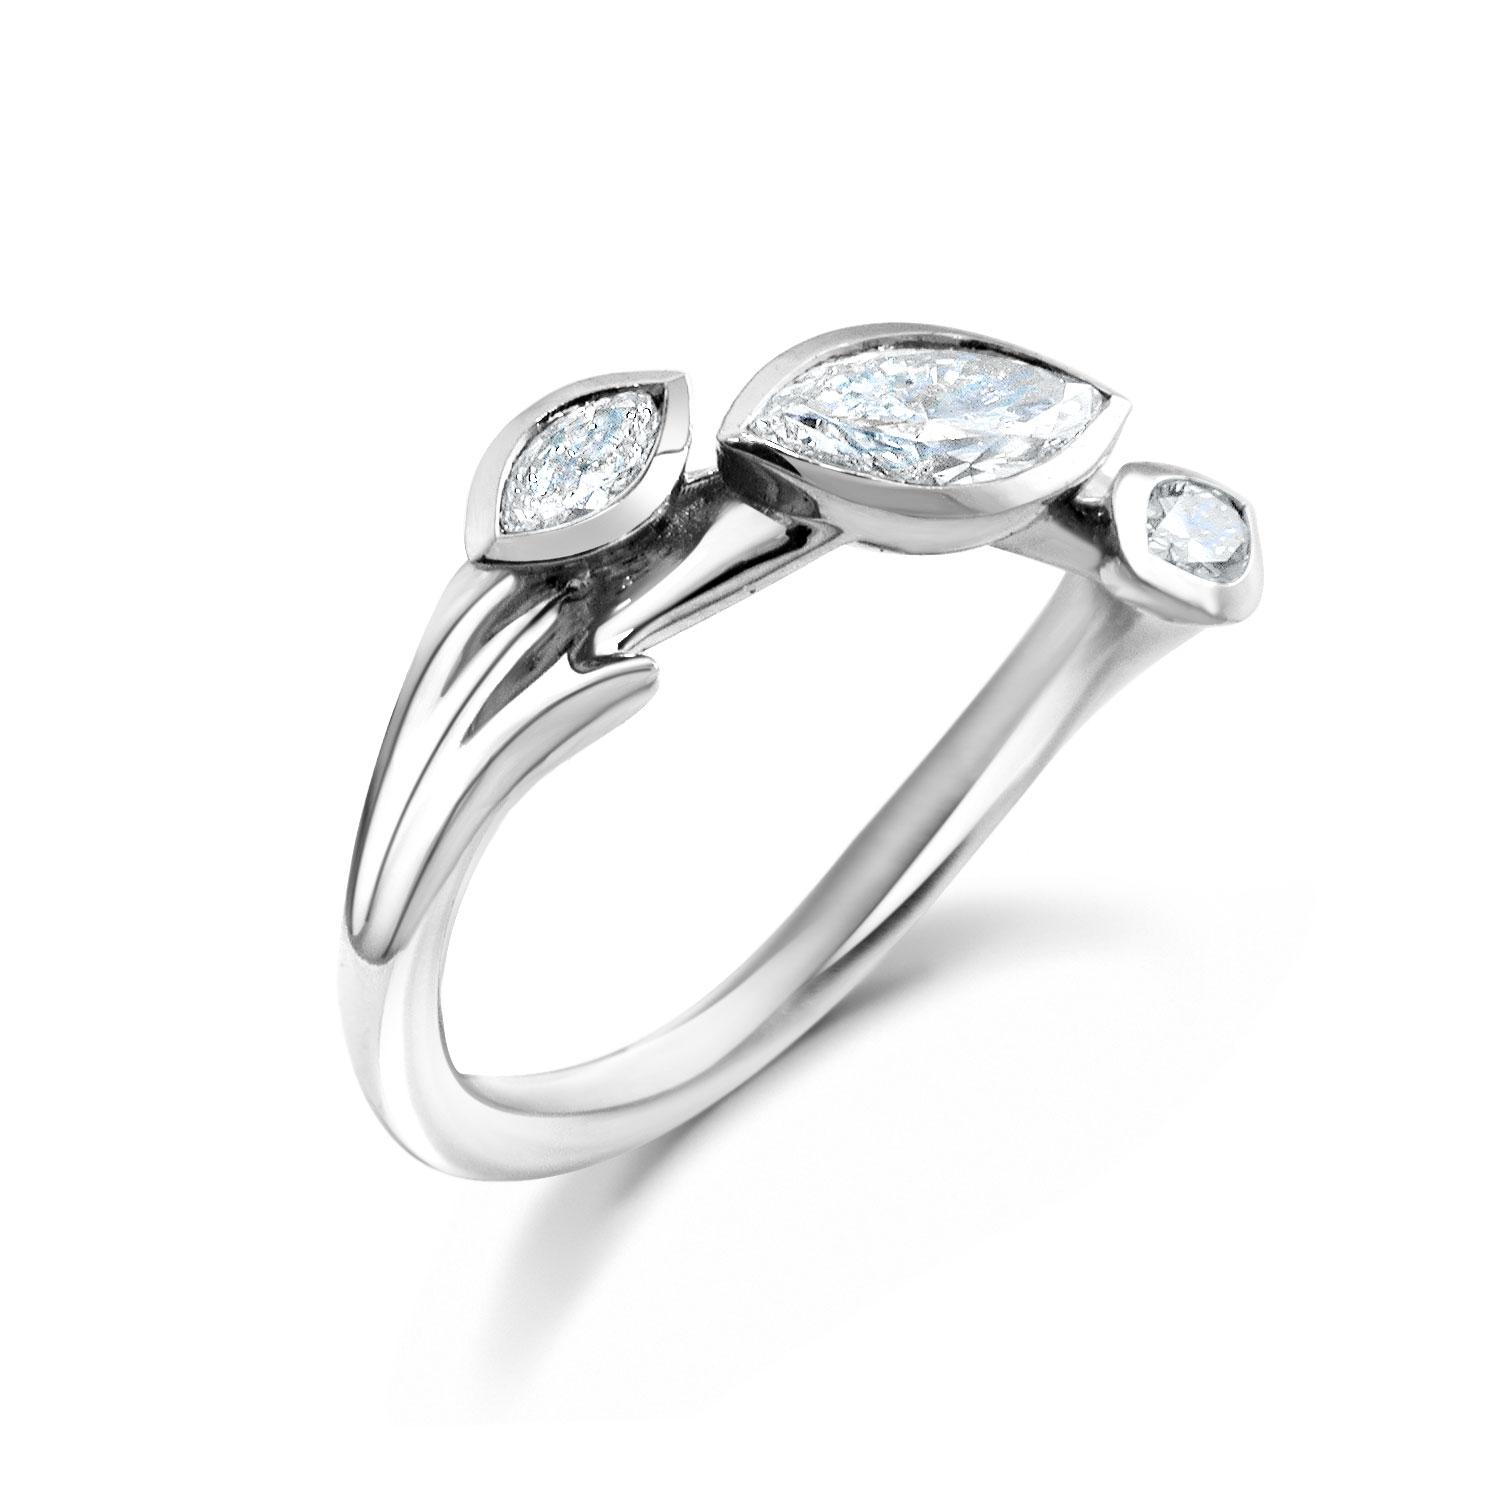 cad-man-jewellery--triple-diamond-ring.jpg